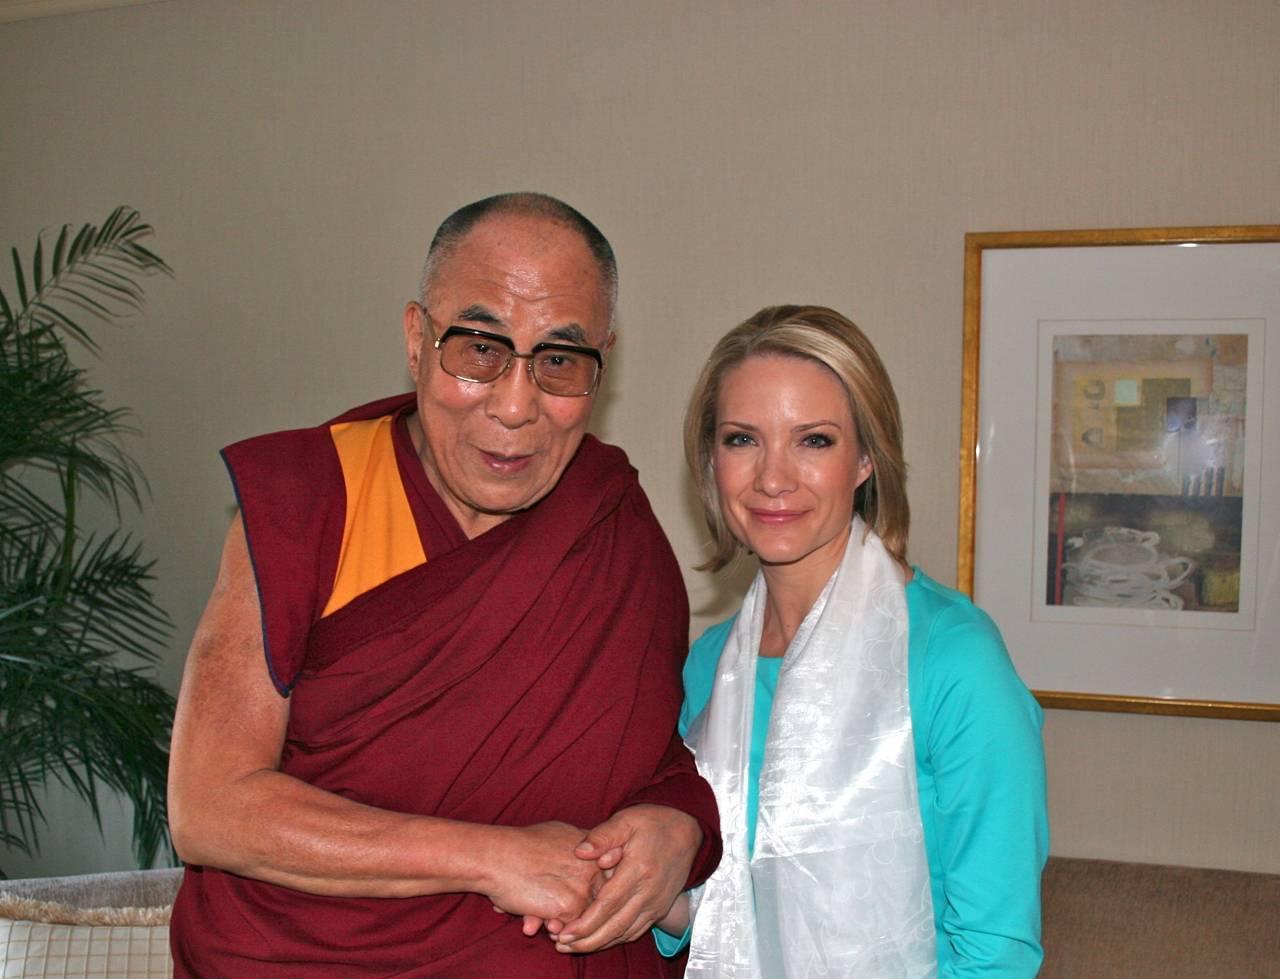 BBG Governors Meet with Dalai Lama